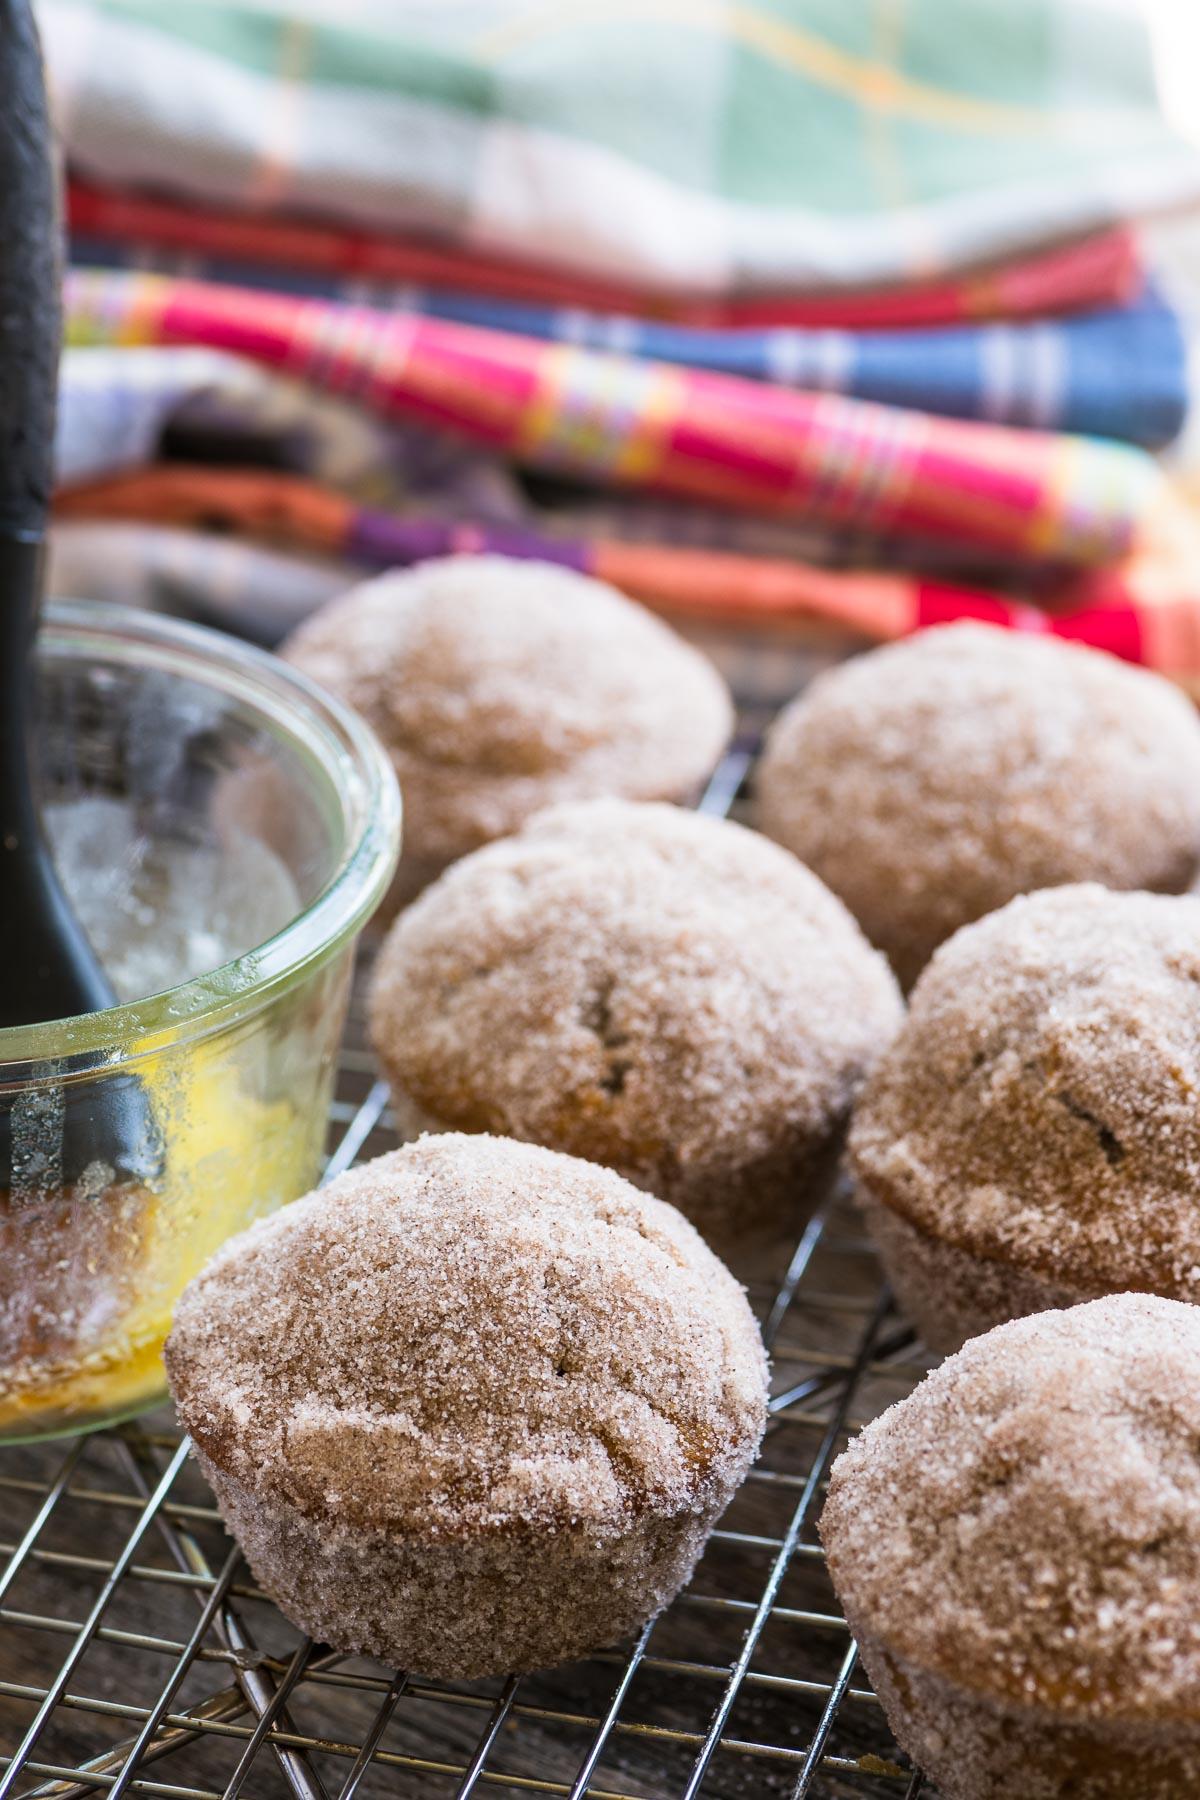 apple cider doughnut muffins on a cooling rack